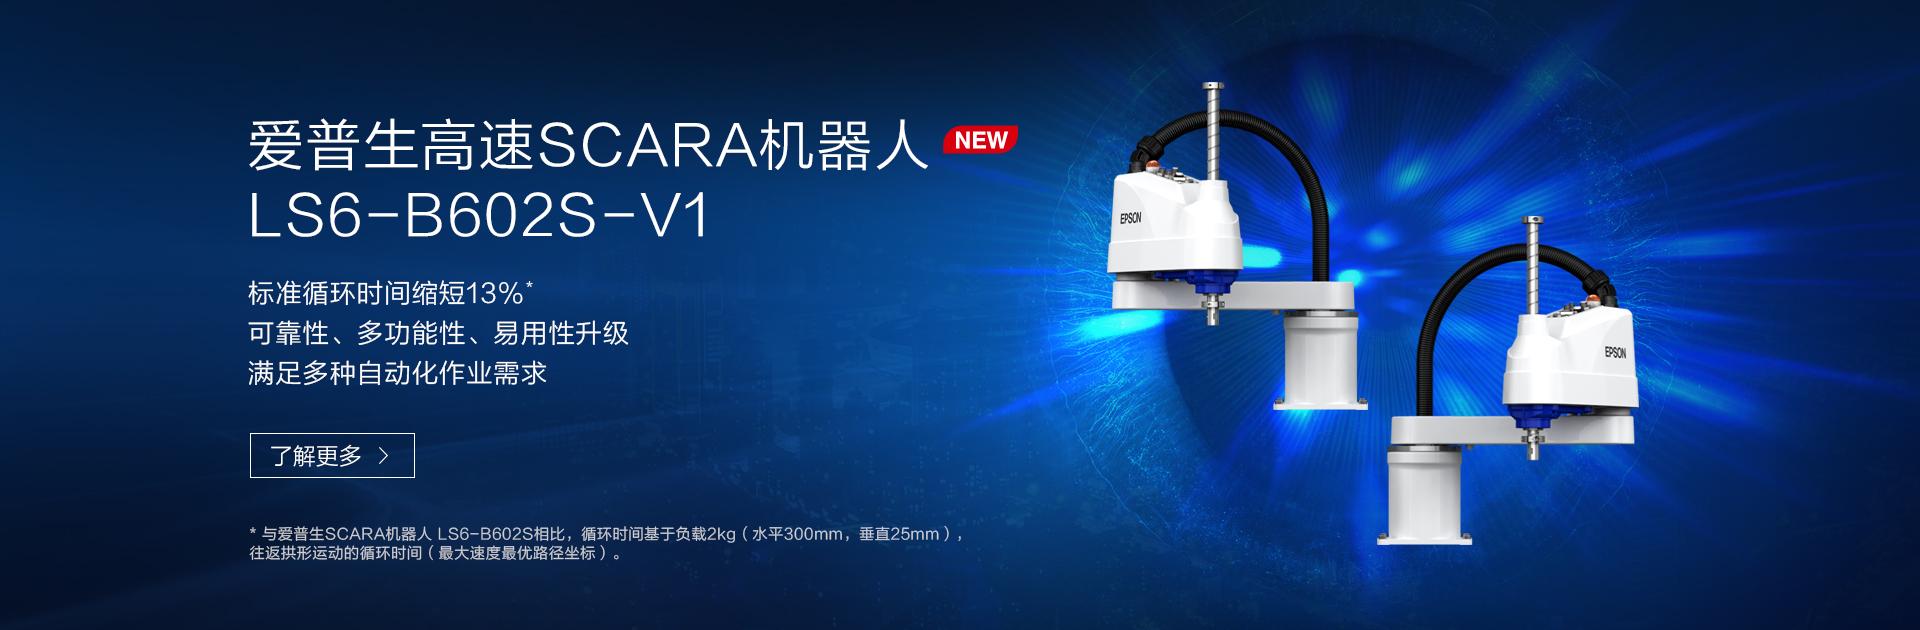 愛普生高速SCARA機器人 Epson LS6-B602S-V1